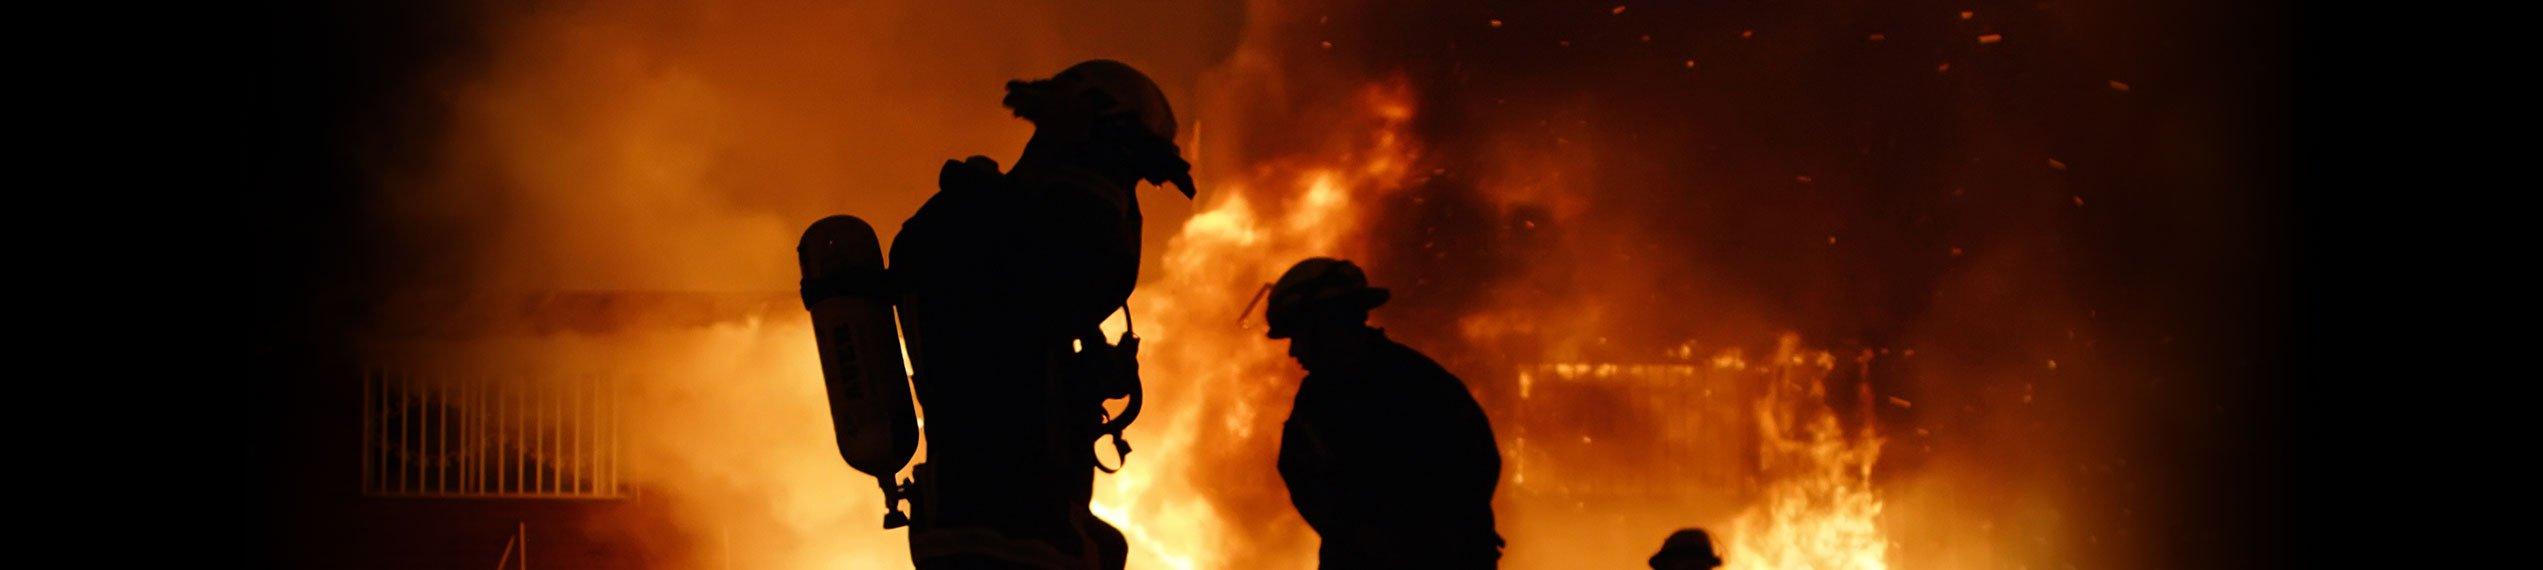 Fire & Smoke Damage Removal in Paul Davis Restoration & Remodeling of Elizabethtown